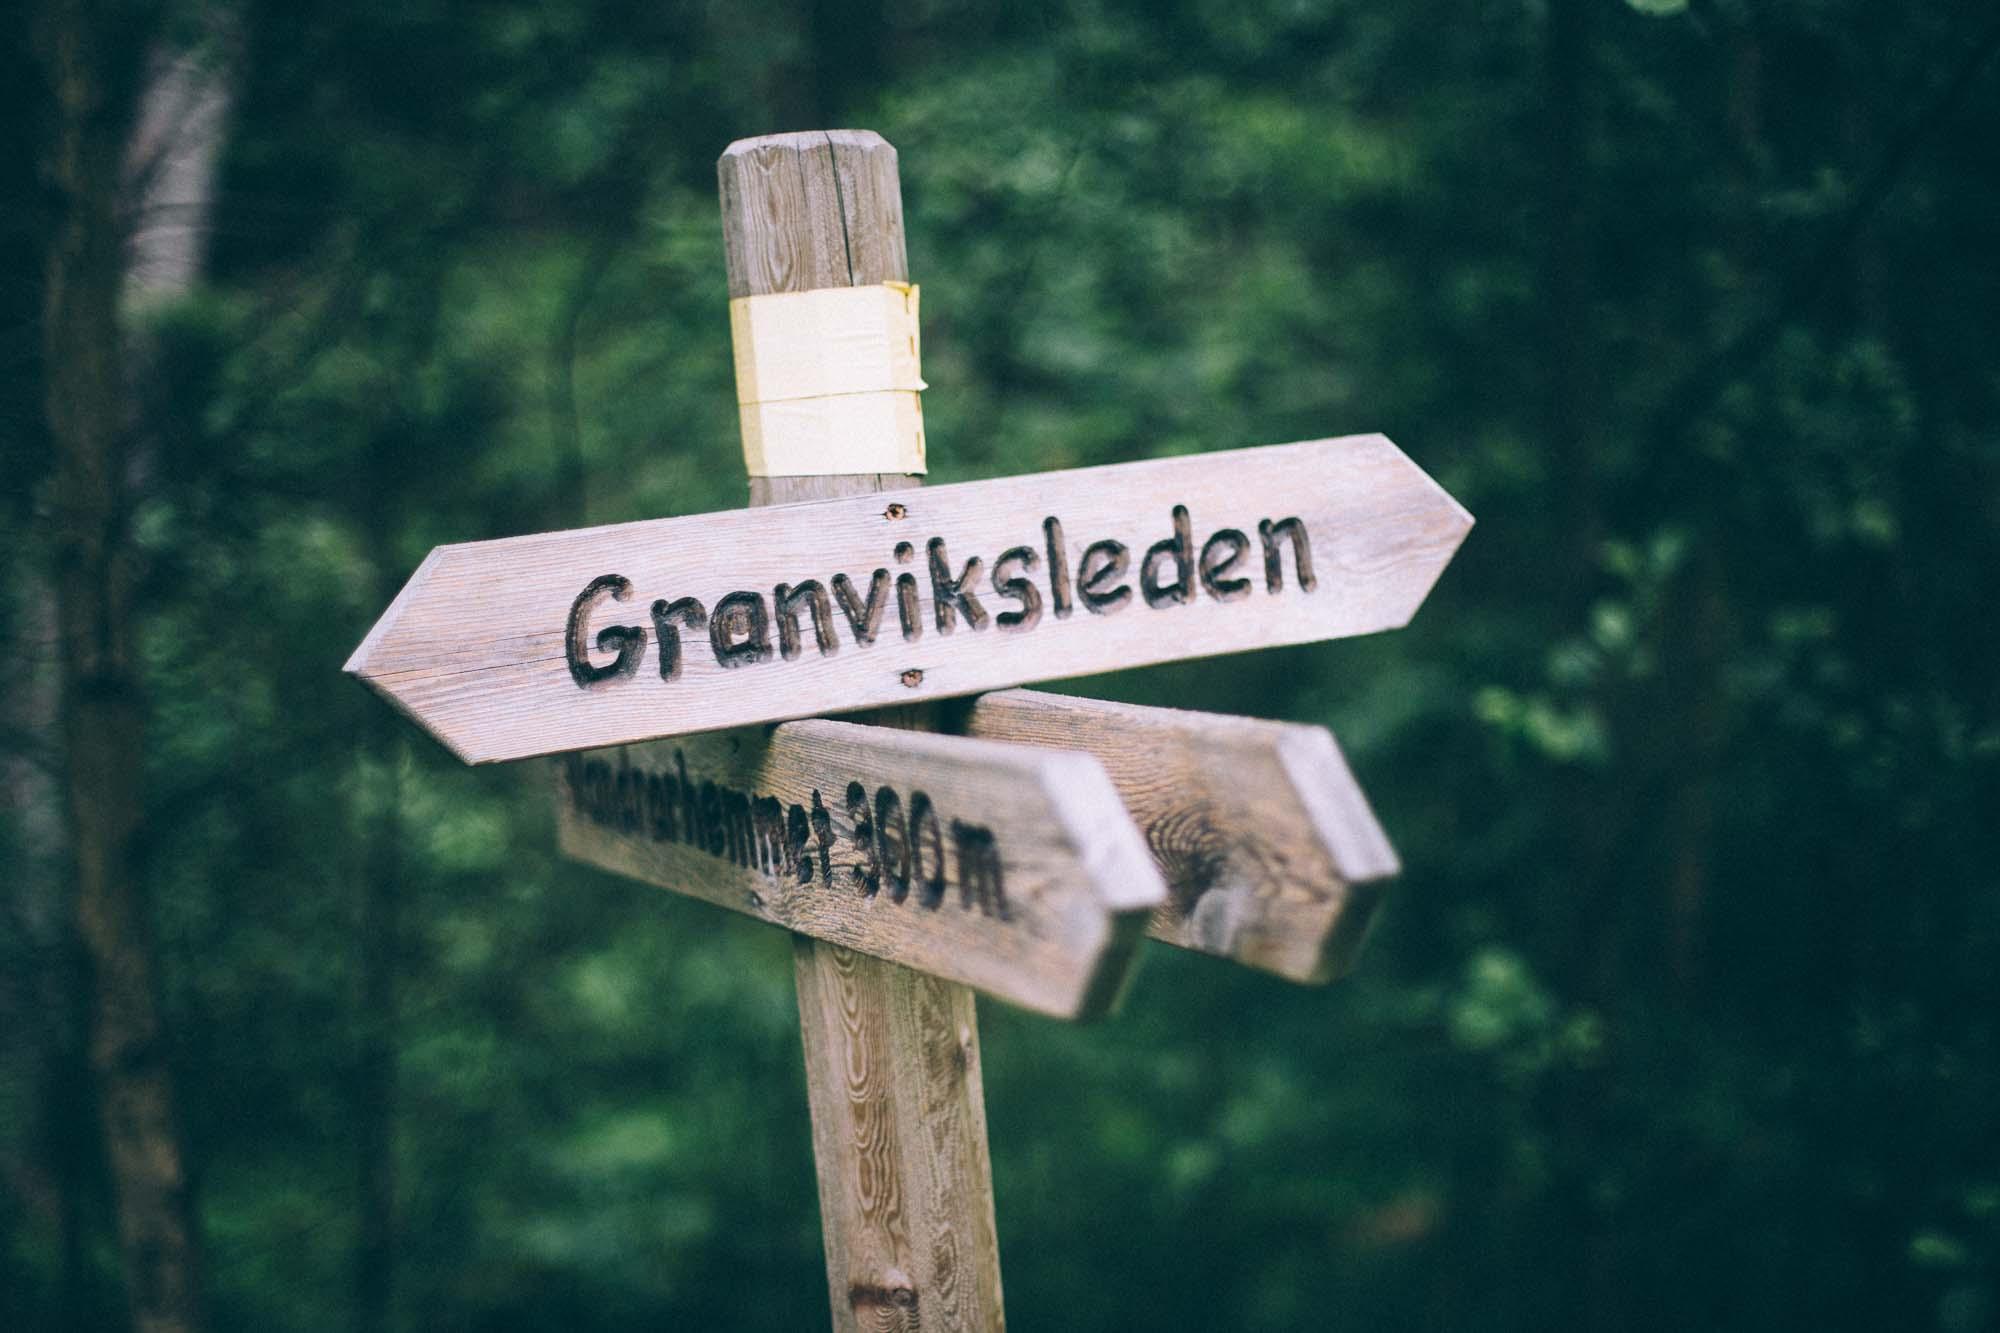 Granviksleden